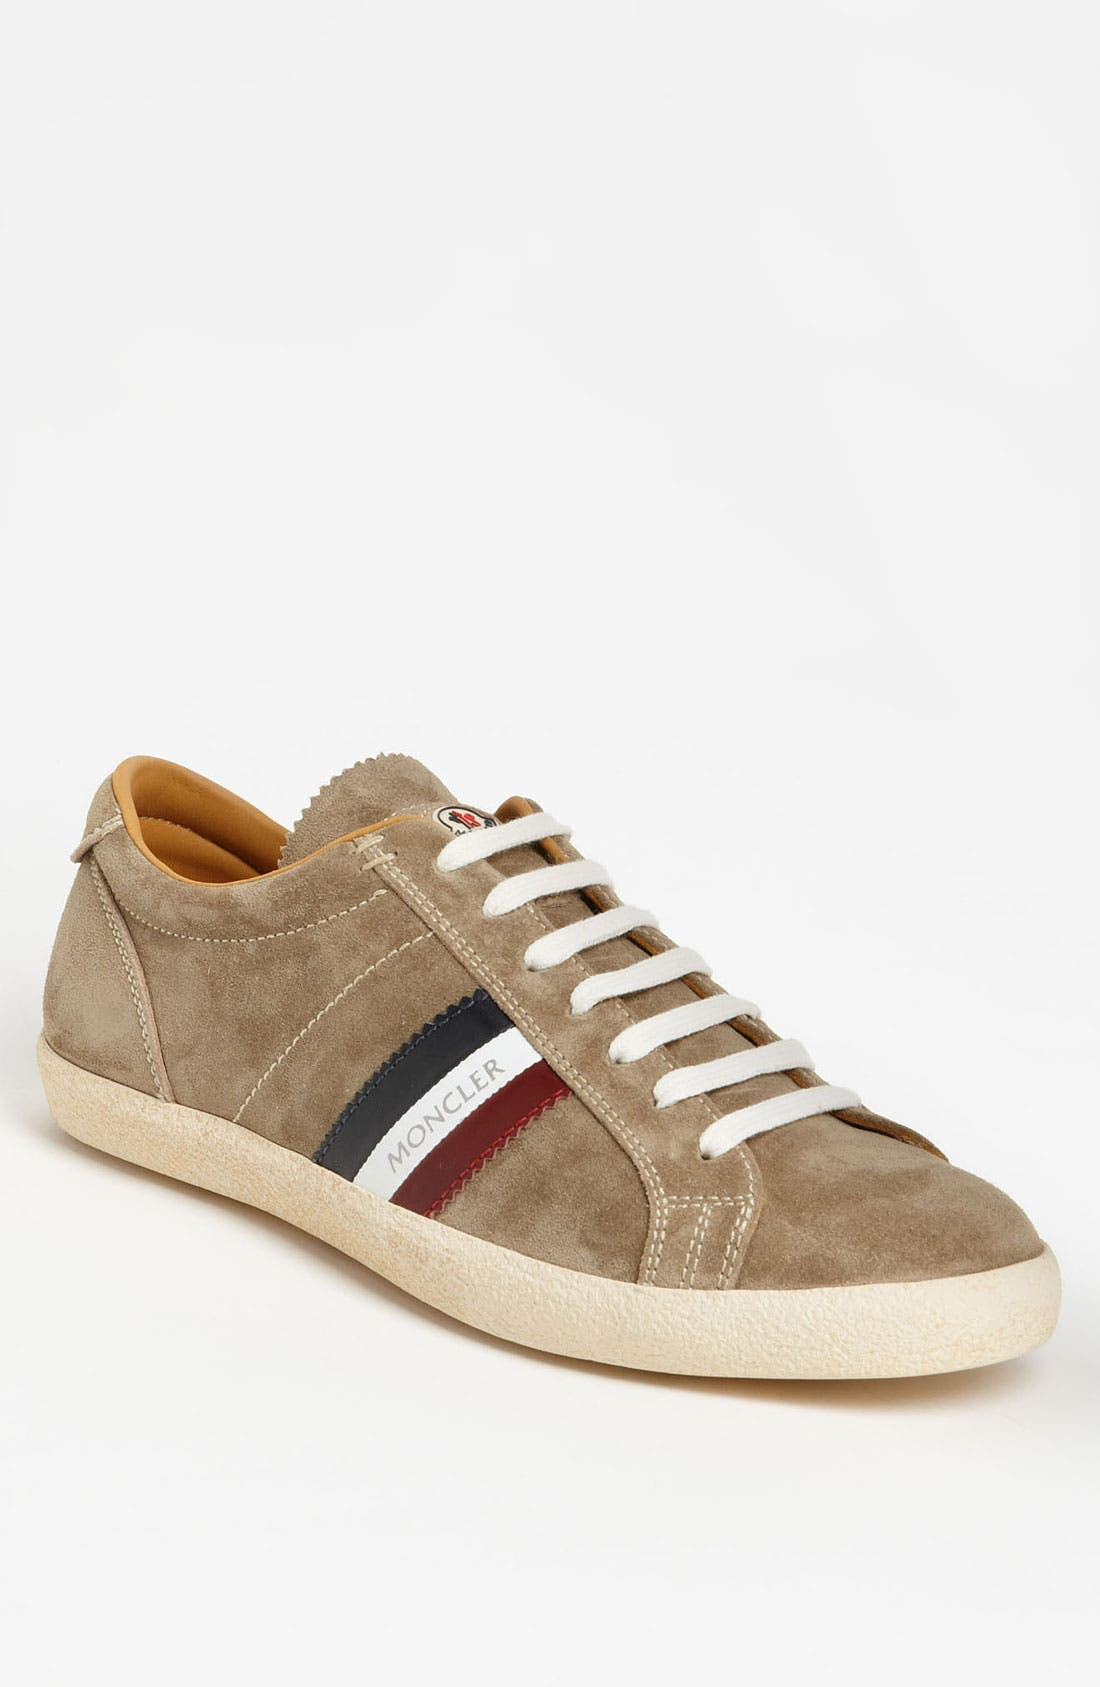 Alternate Image 1 Selected - Moncler 'Monaco' Suede Sneaker